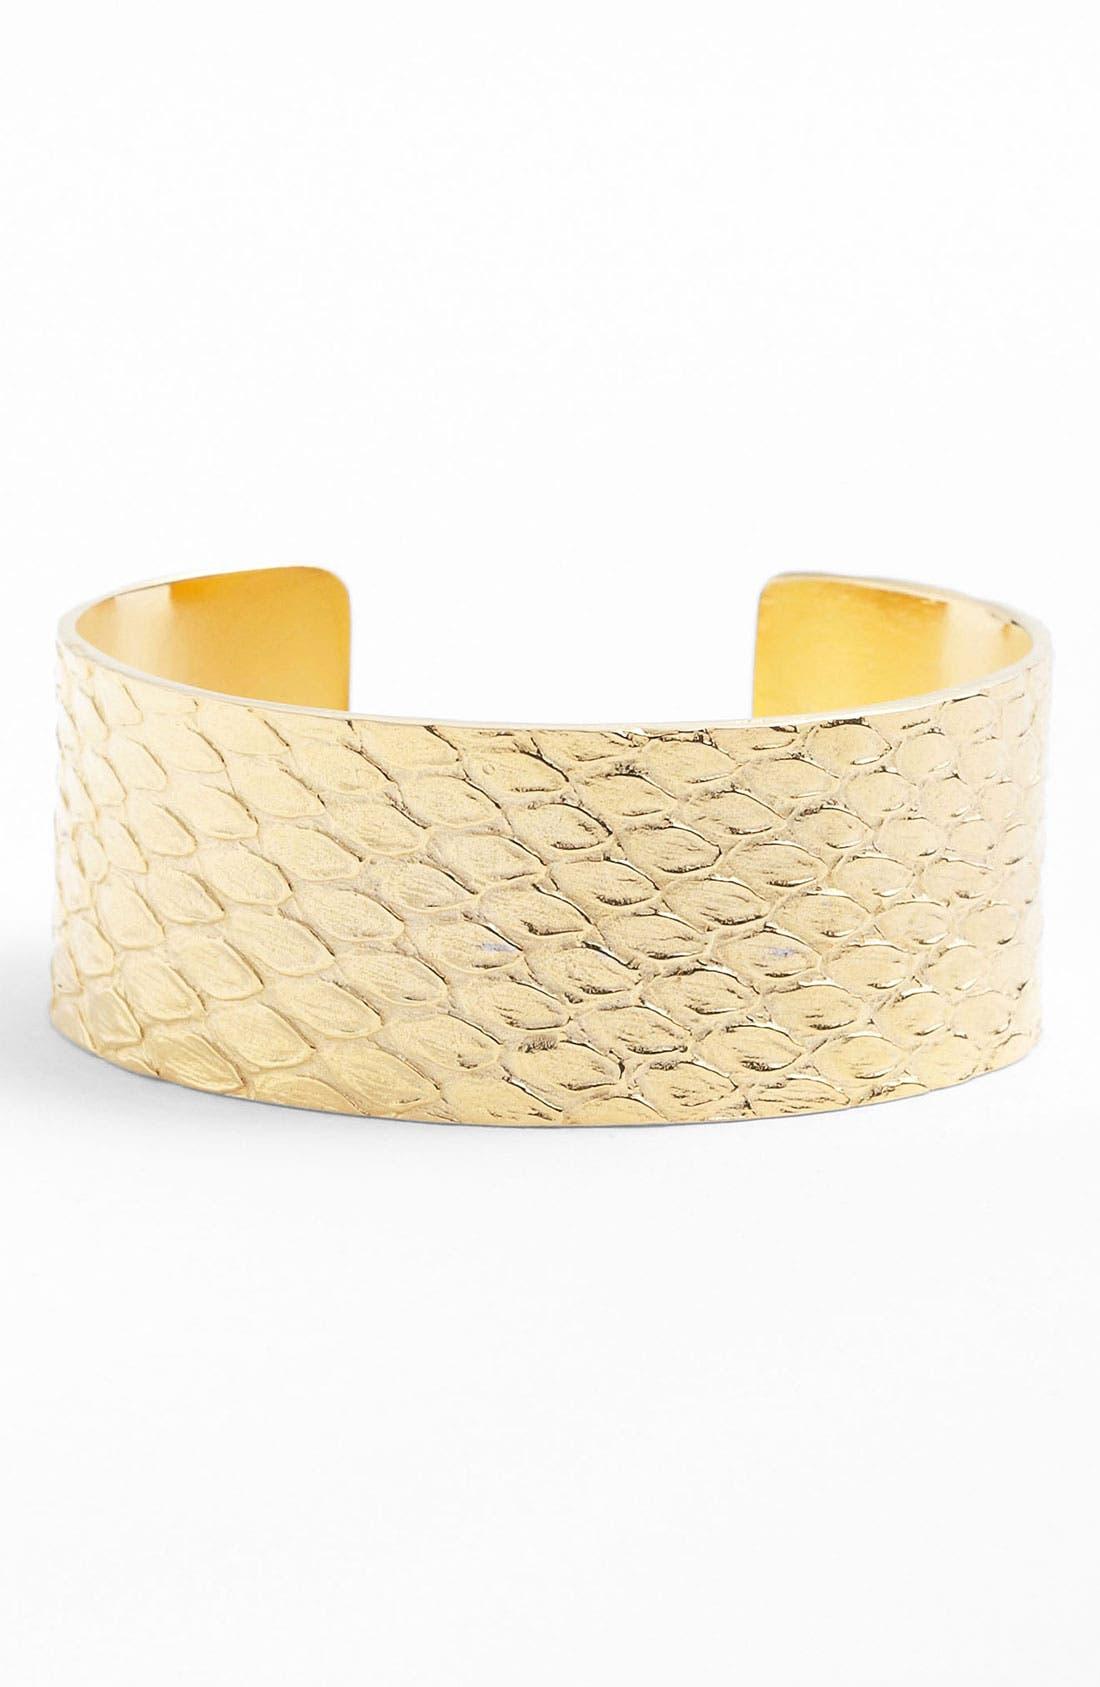 Alternate Image 1 Selected - Tom Binns Snakeskin Textured Cuff